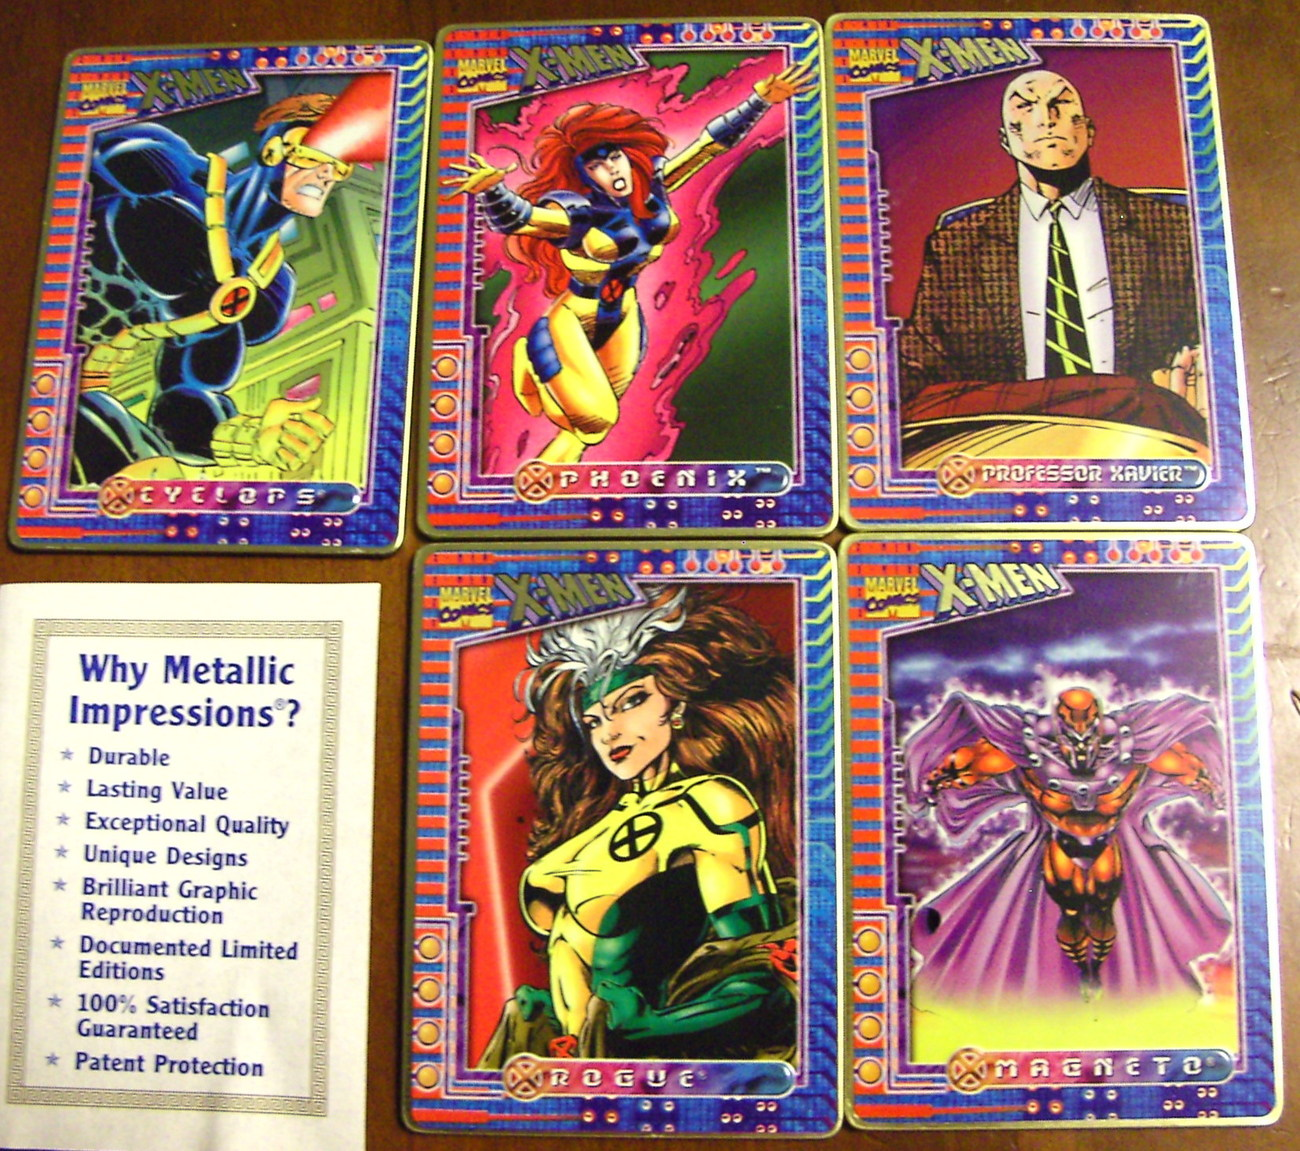 Ultra RARE Official X-Men Metallic Impressions Card Set w Tin + BONUS XME Cards!